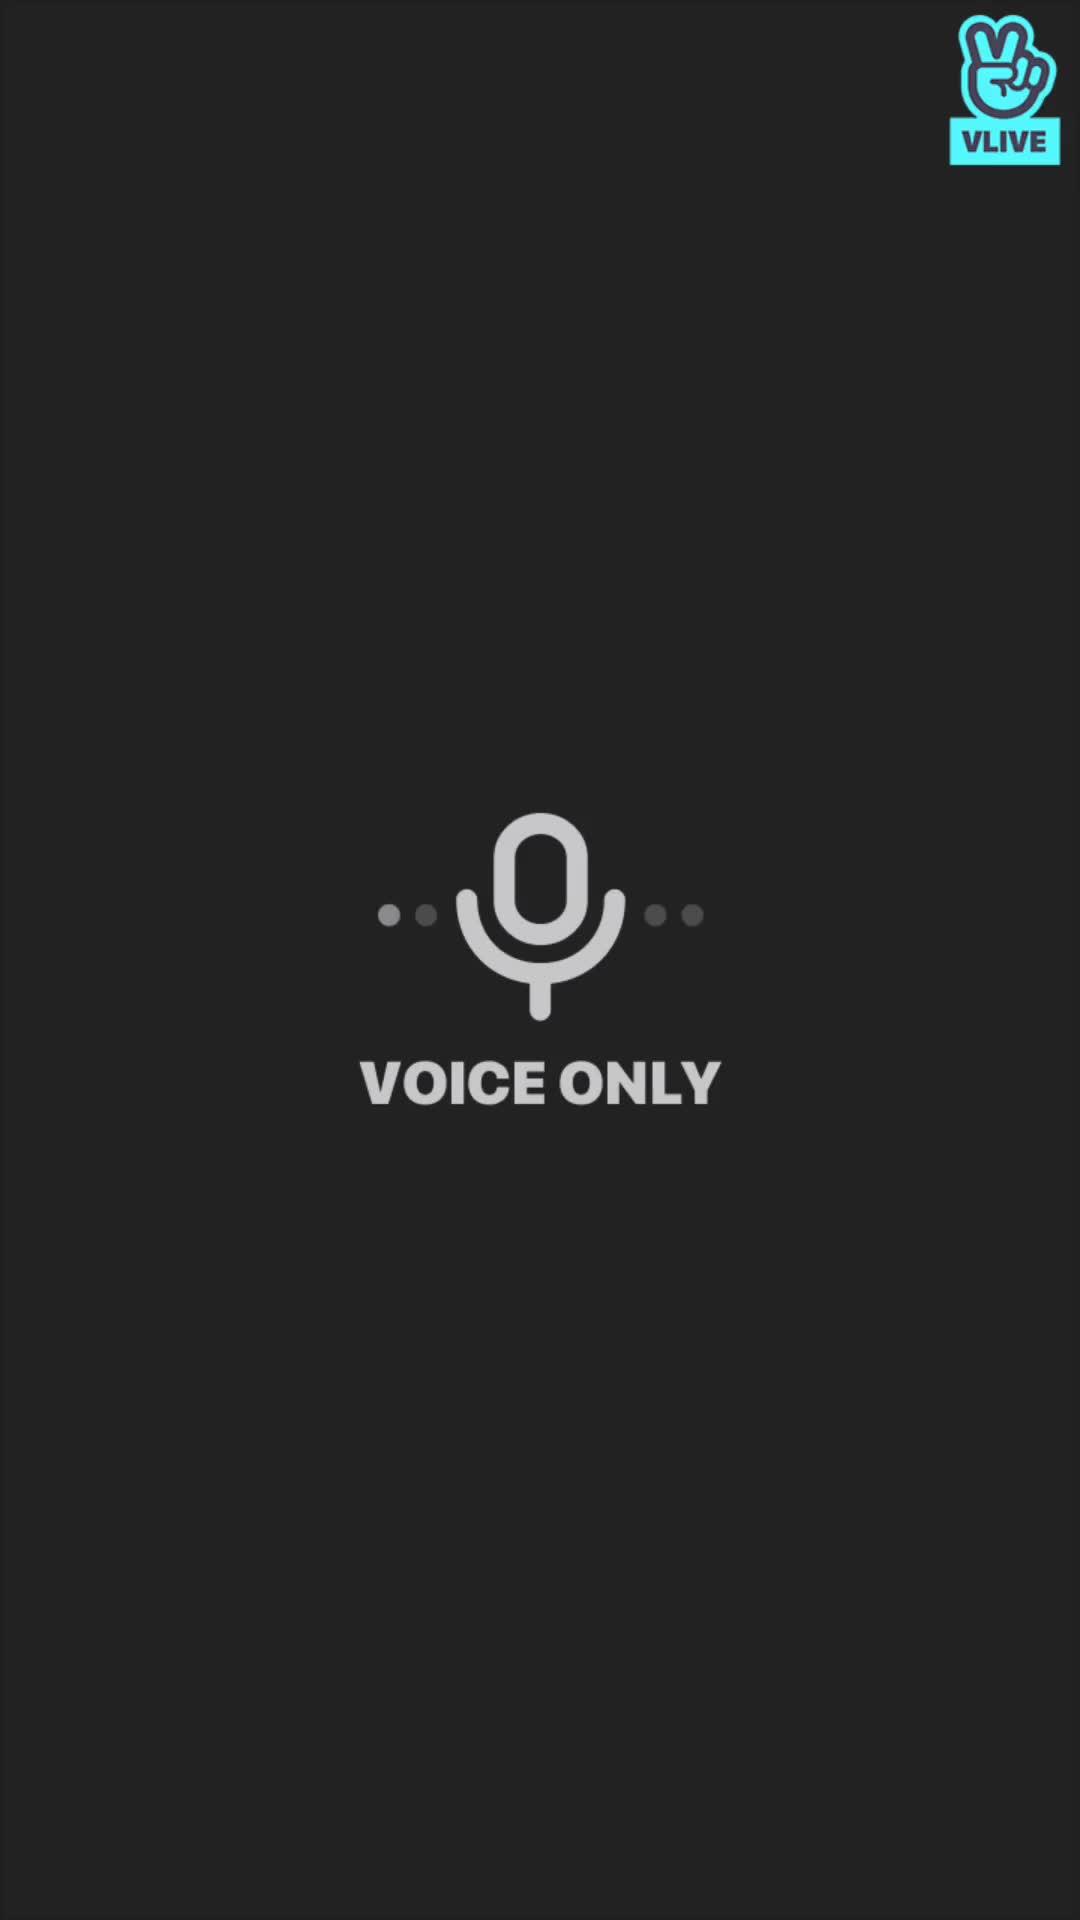 [RADIO]캐럿들 귀대귀대#78 호랑이의 청각